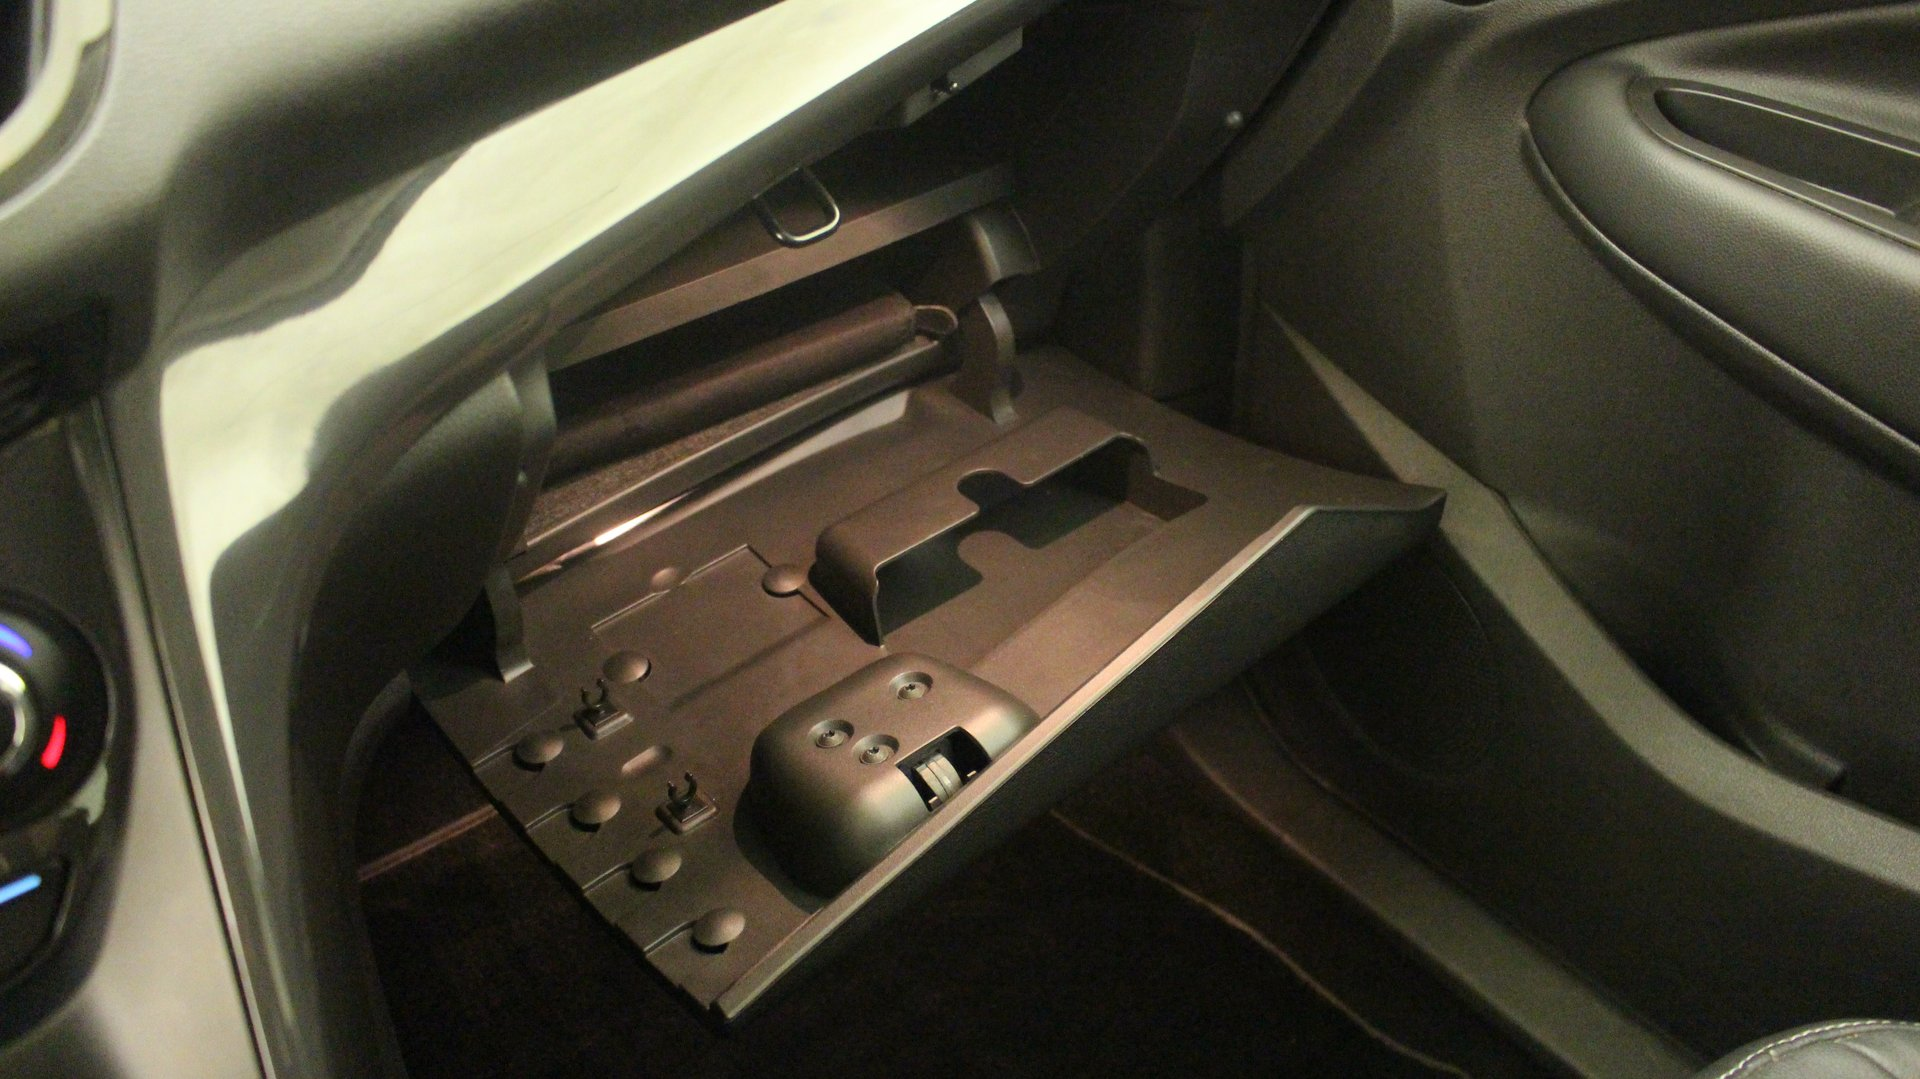 ford kuga 4x2 et suv 5 portes diesel 2 0 tdci 163 4x4 bo te automatique ou robotis e. Black Bedroom Furniture Sets. Home Design Ideas